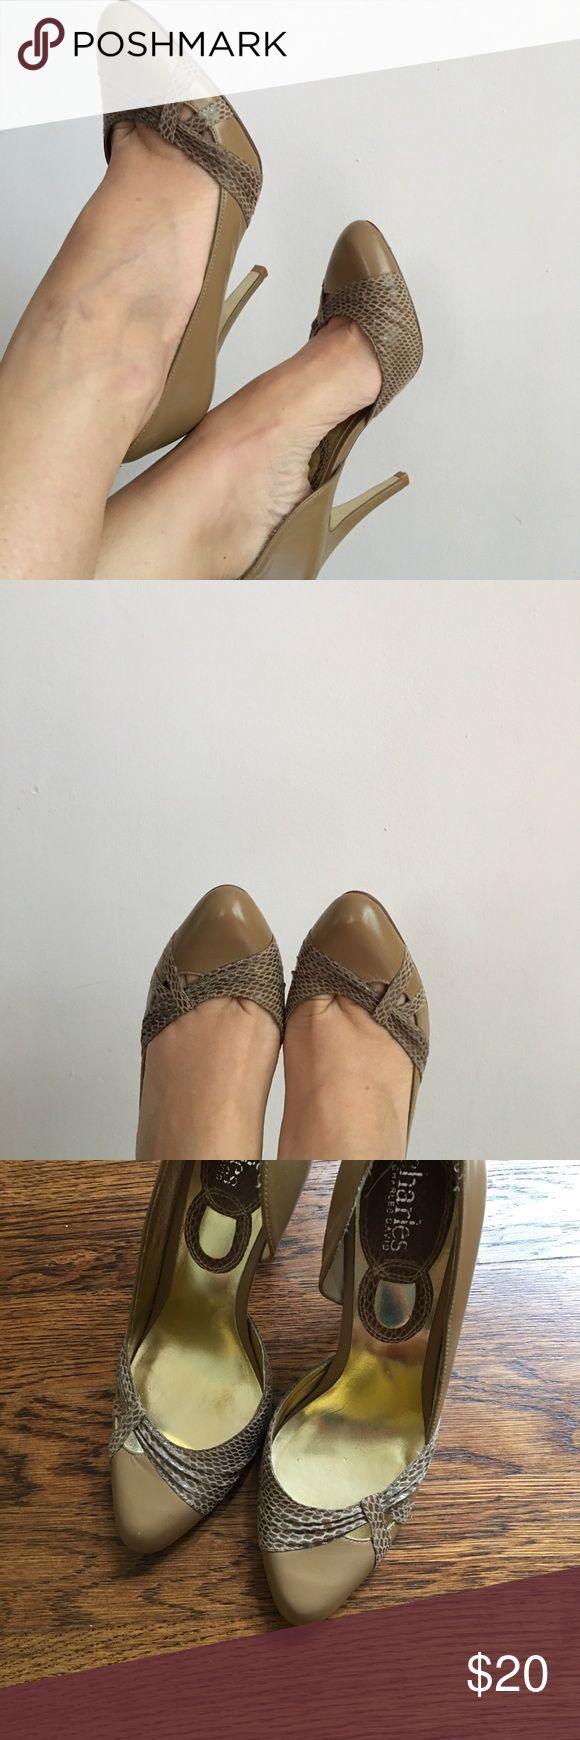 Charles David nude heels. Size 6. Leather! Beautiful Charles David heels. Nude leather. Size 6. Super sexy. Charles David Shoes Heels